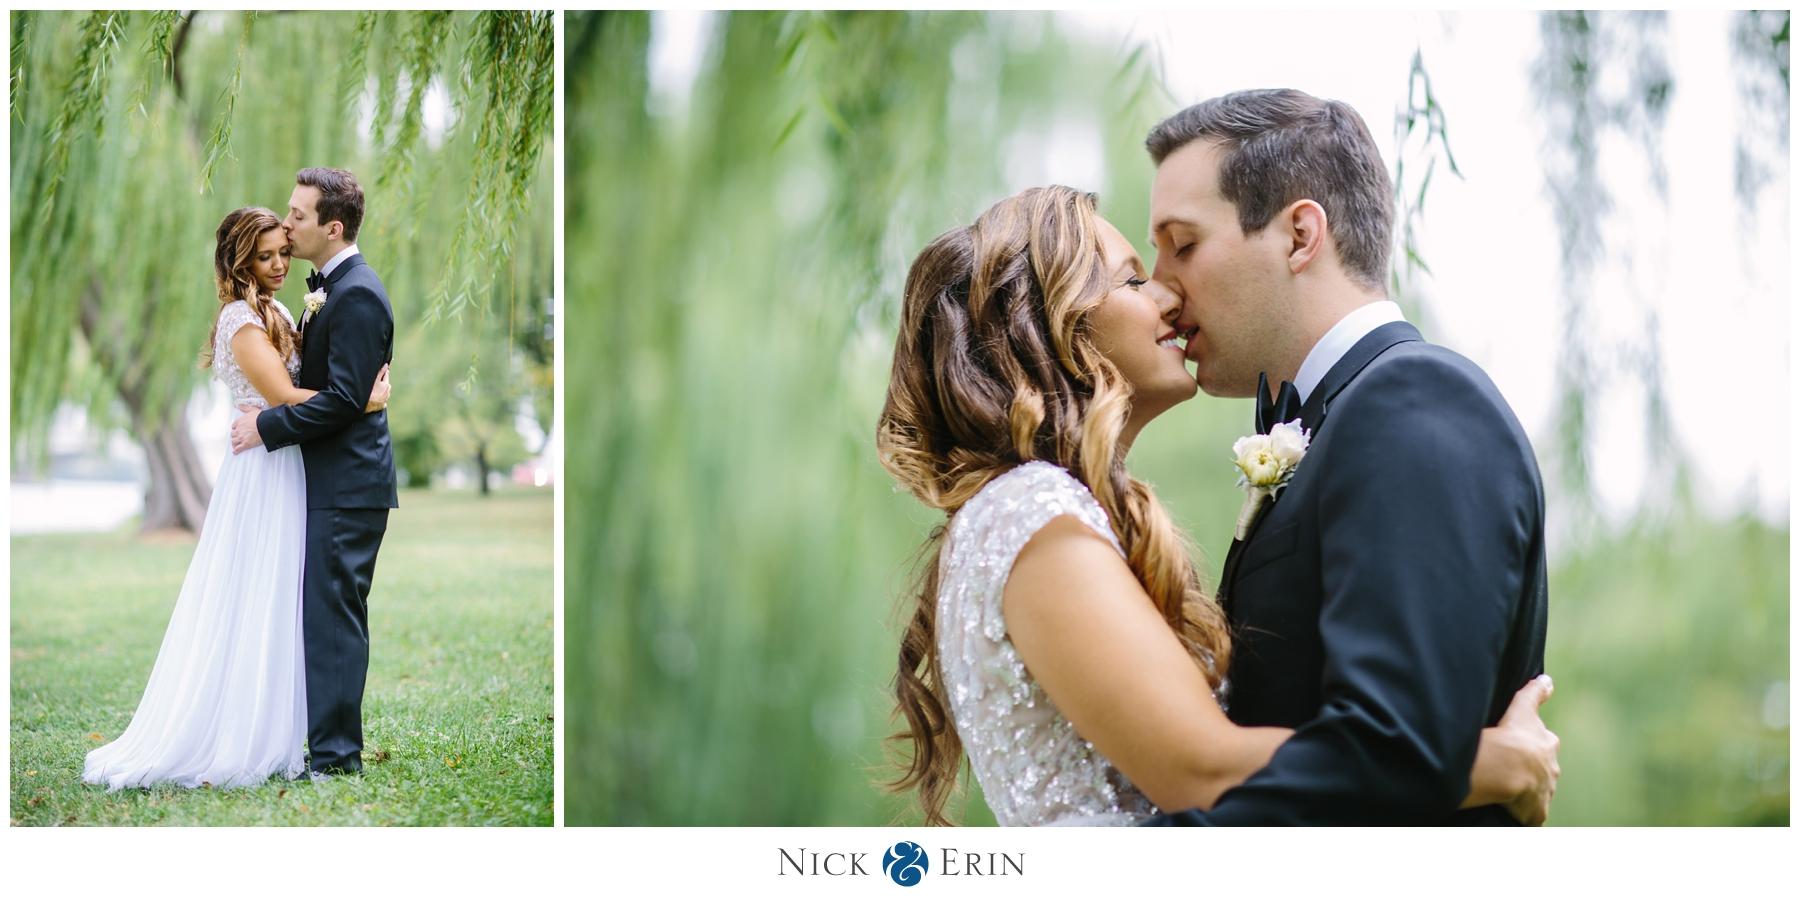 donner_photography_washington-dc-wedding_ariel-patrick_0038